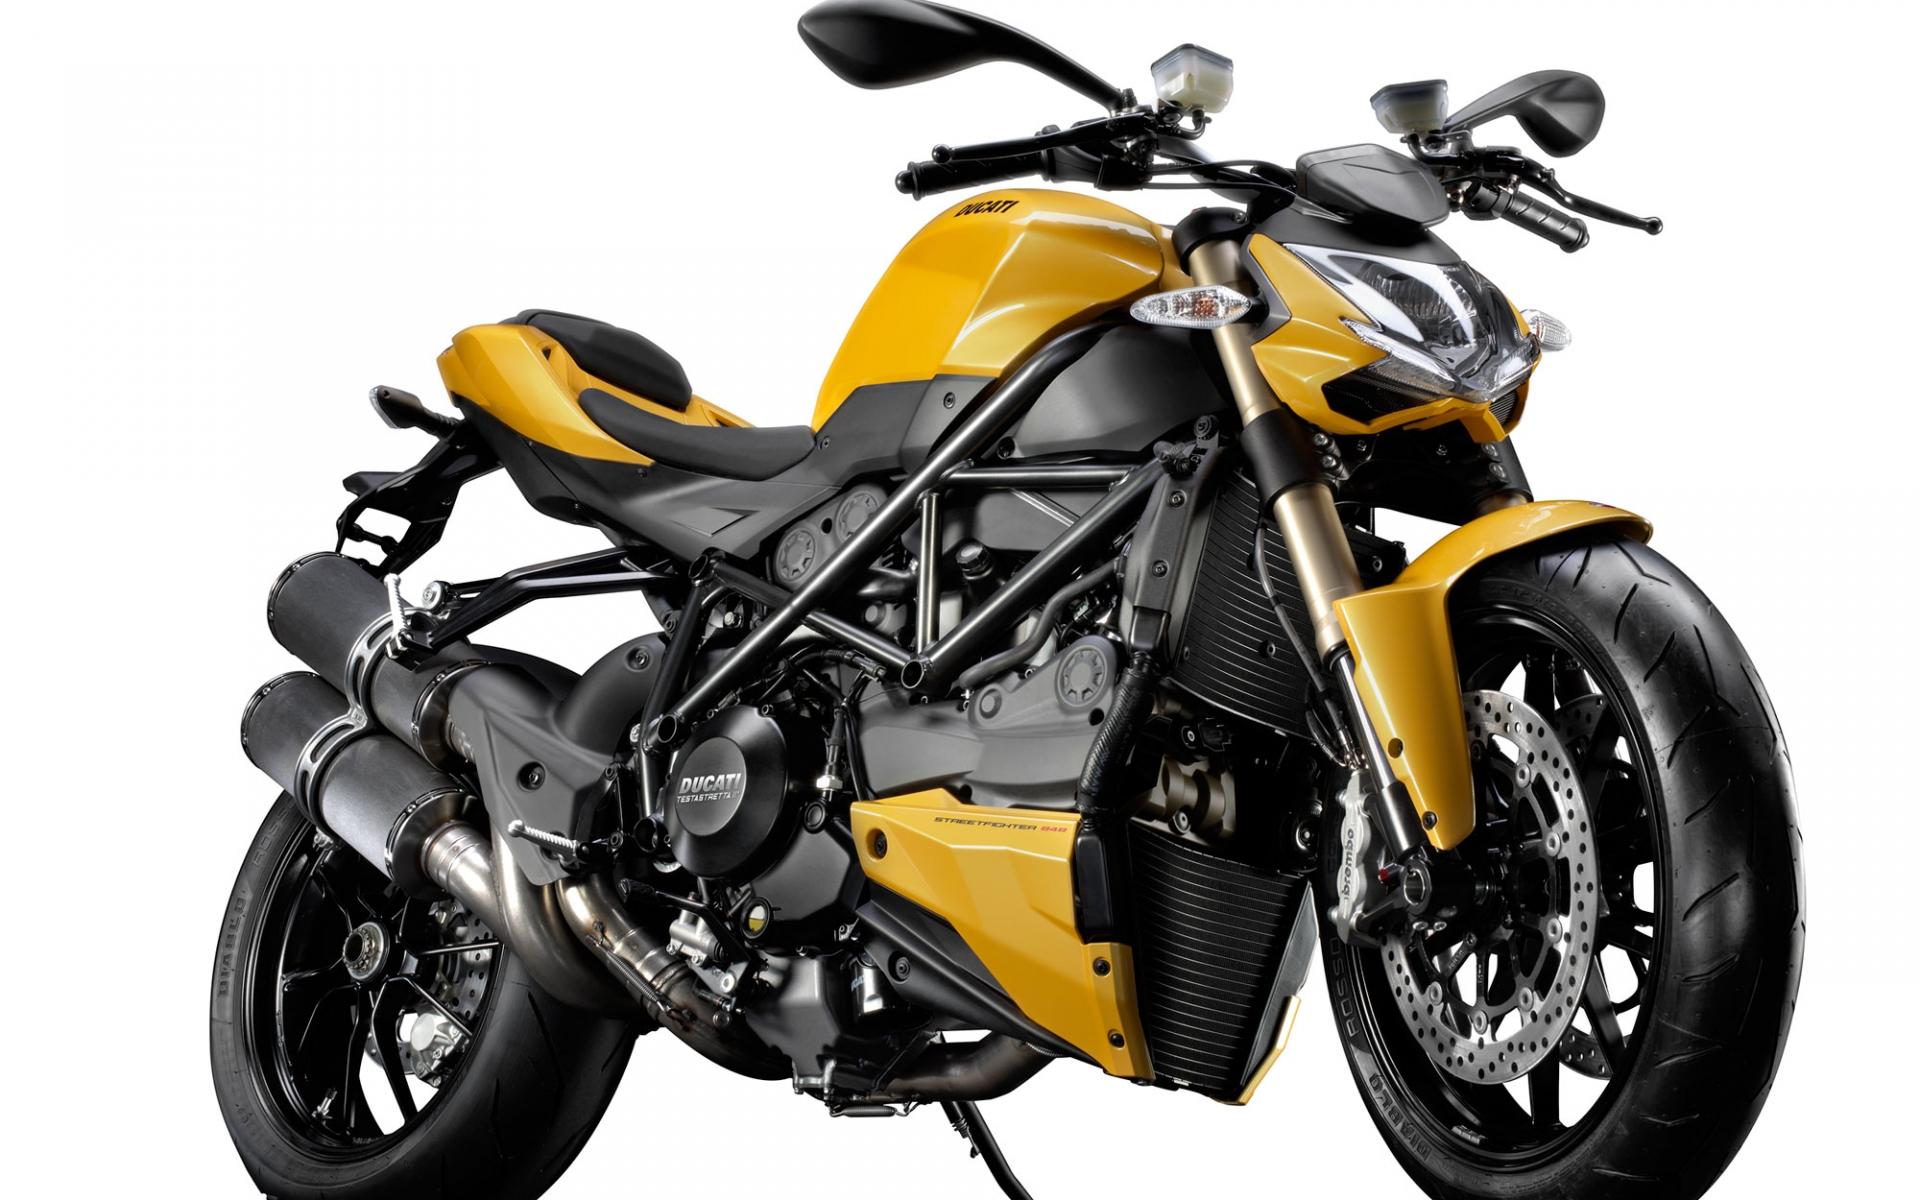 Ducati Streetfighter 848 - 1920x1200